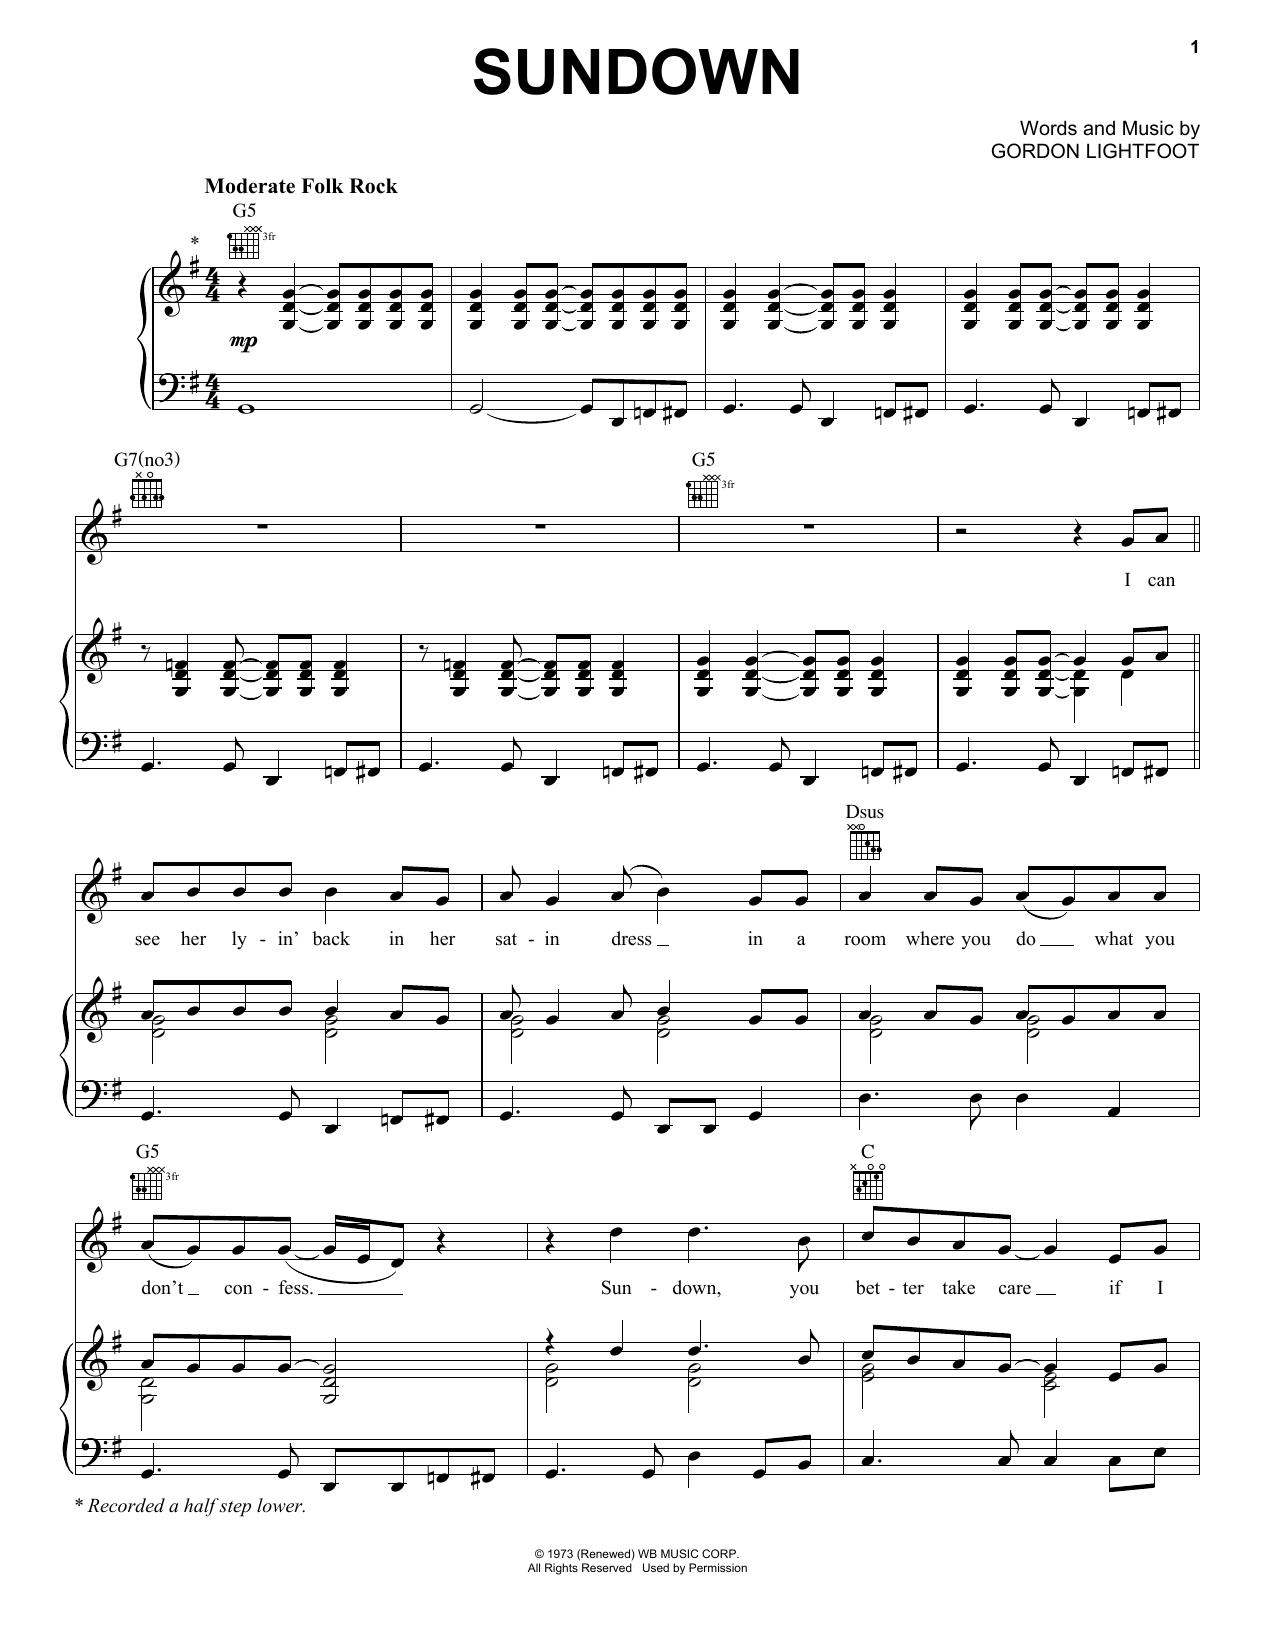 Gordon Lightfoot Sundown sheet music notes and chords. Download Printable PDF.